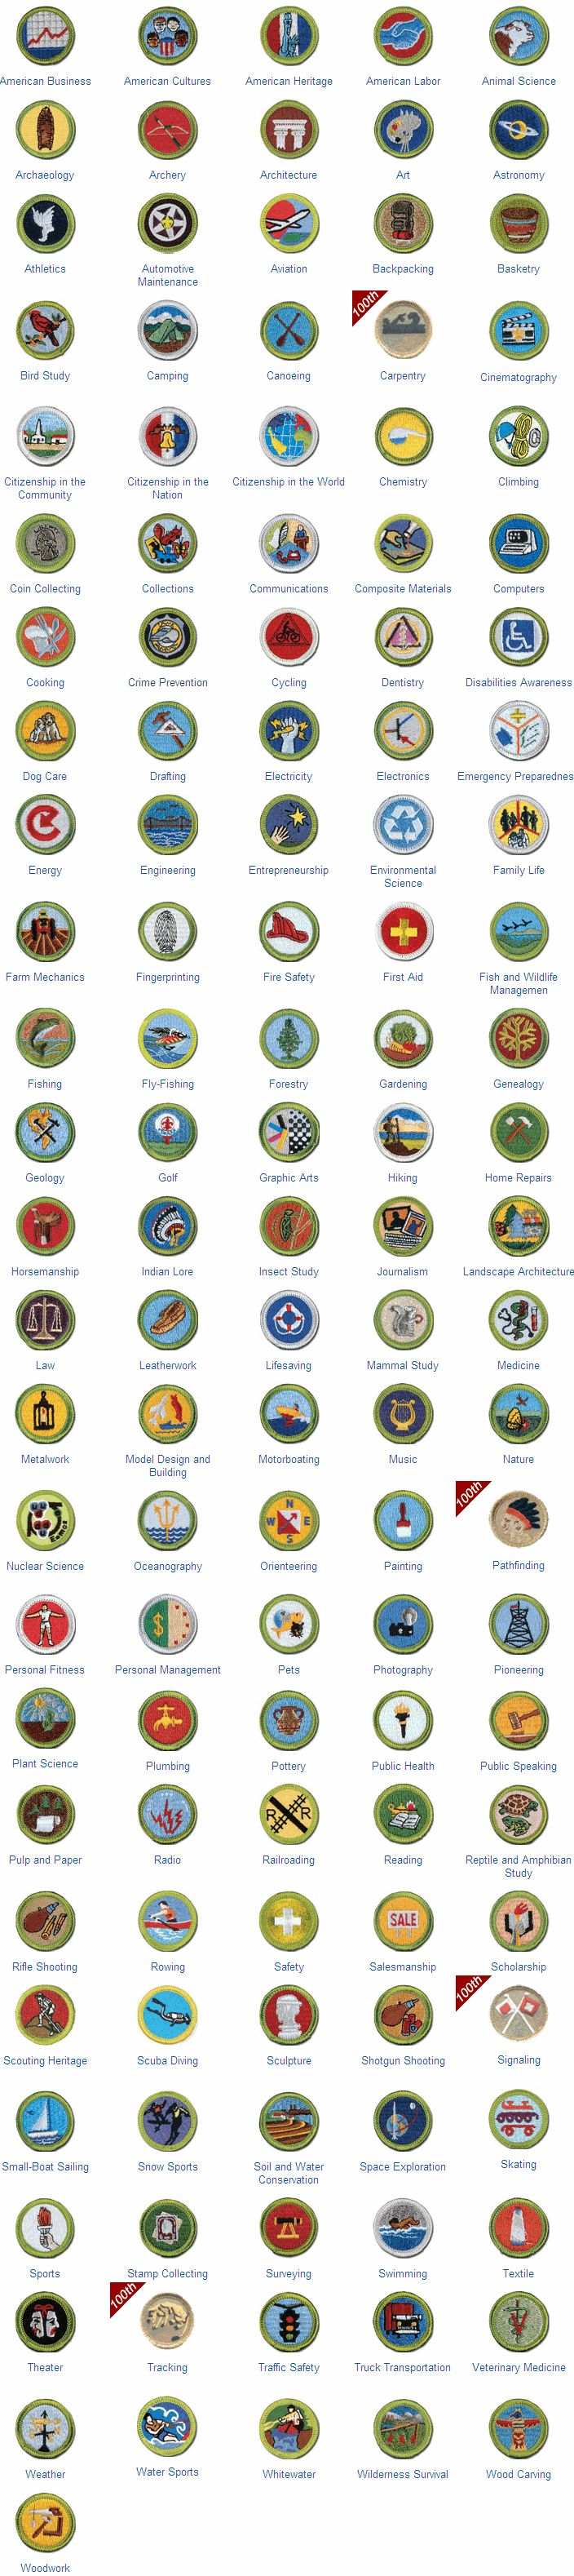 Boy Scout Uniform Inspection Sheet - Boy Scouts of America